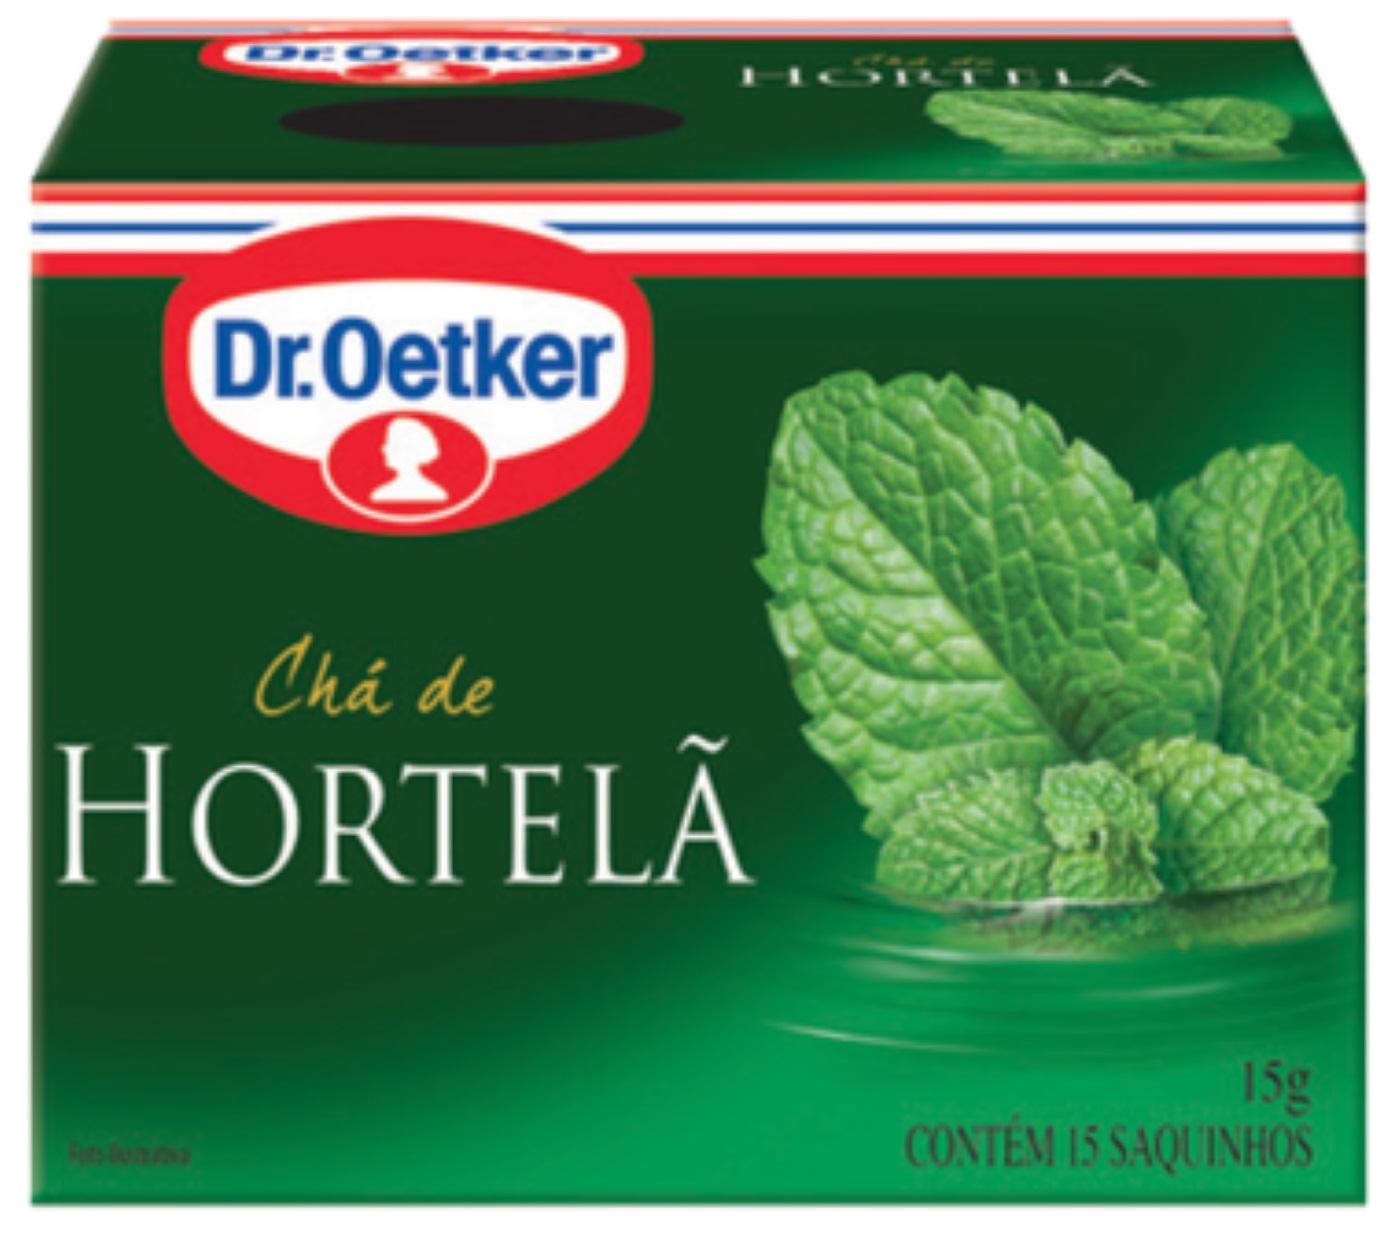 CHÁ DE HORTELÃ DR. OETKER KIT C/ 4 UNIDADES